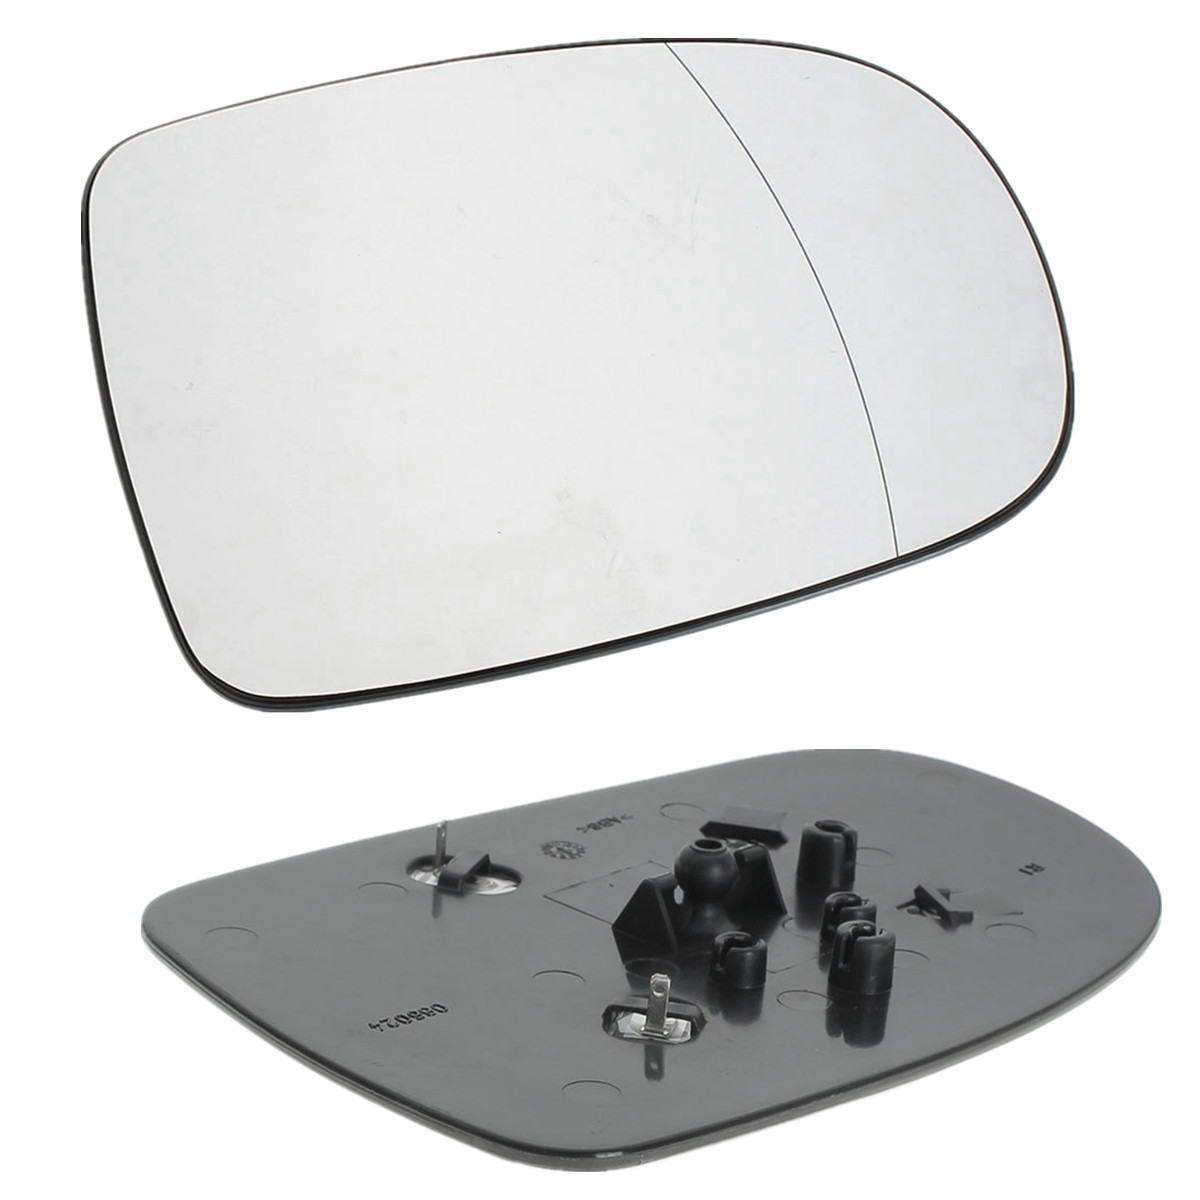 ¿Del lado del conductor de puerta de ala de espejo de vidrio climatizada para Opel CORSA C MK2 2001, 2002, 2003, 2004, 2005, 2006